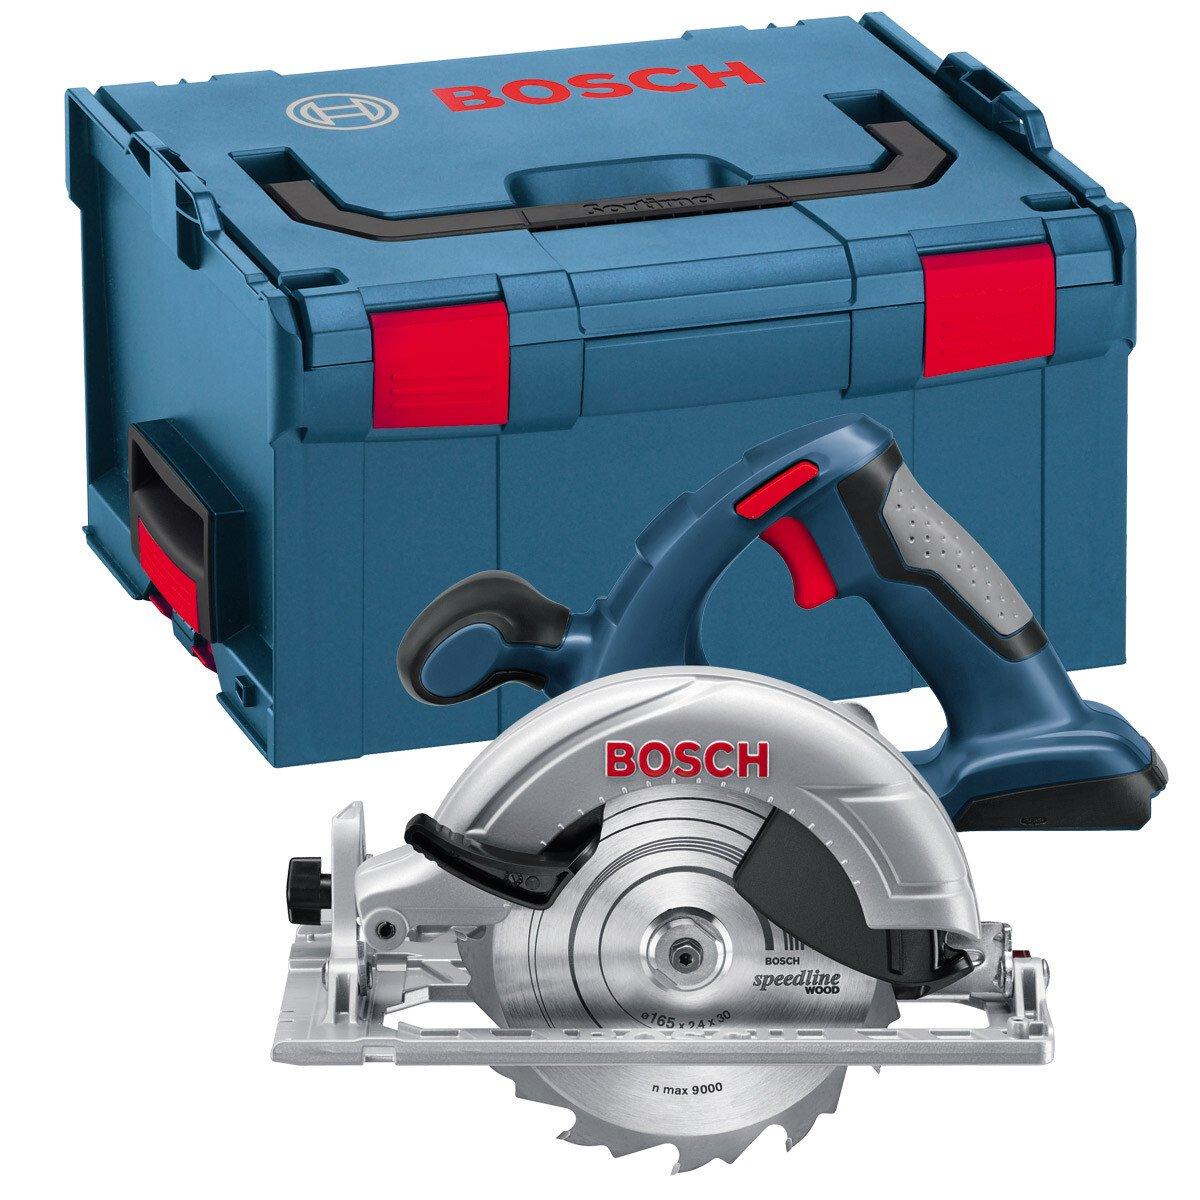 Bosch GKS 18 V-LIN Body Only 18V Li-ion Cordless Circular Saw in L-Boxx